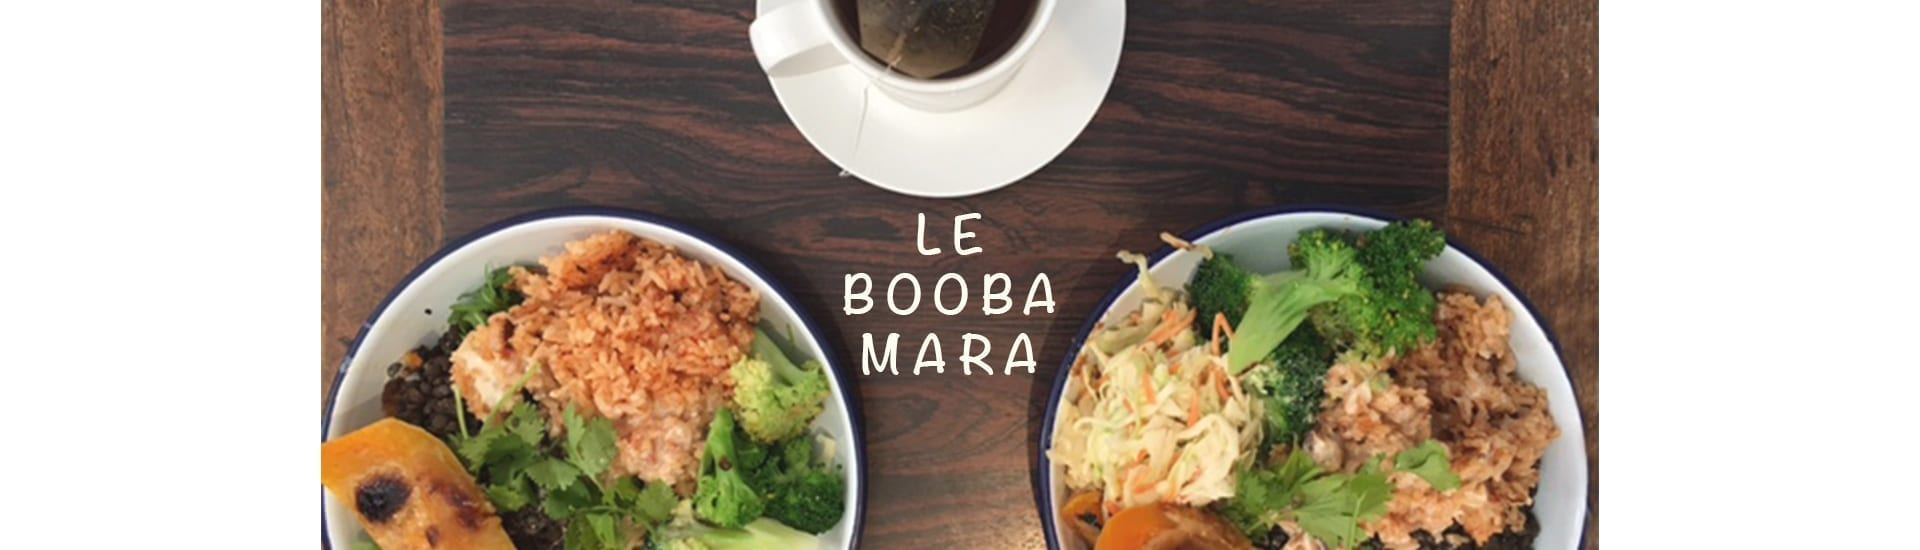 Déjeuner végétarien au Booba Mara à Paris